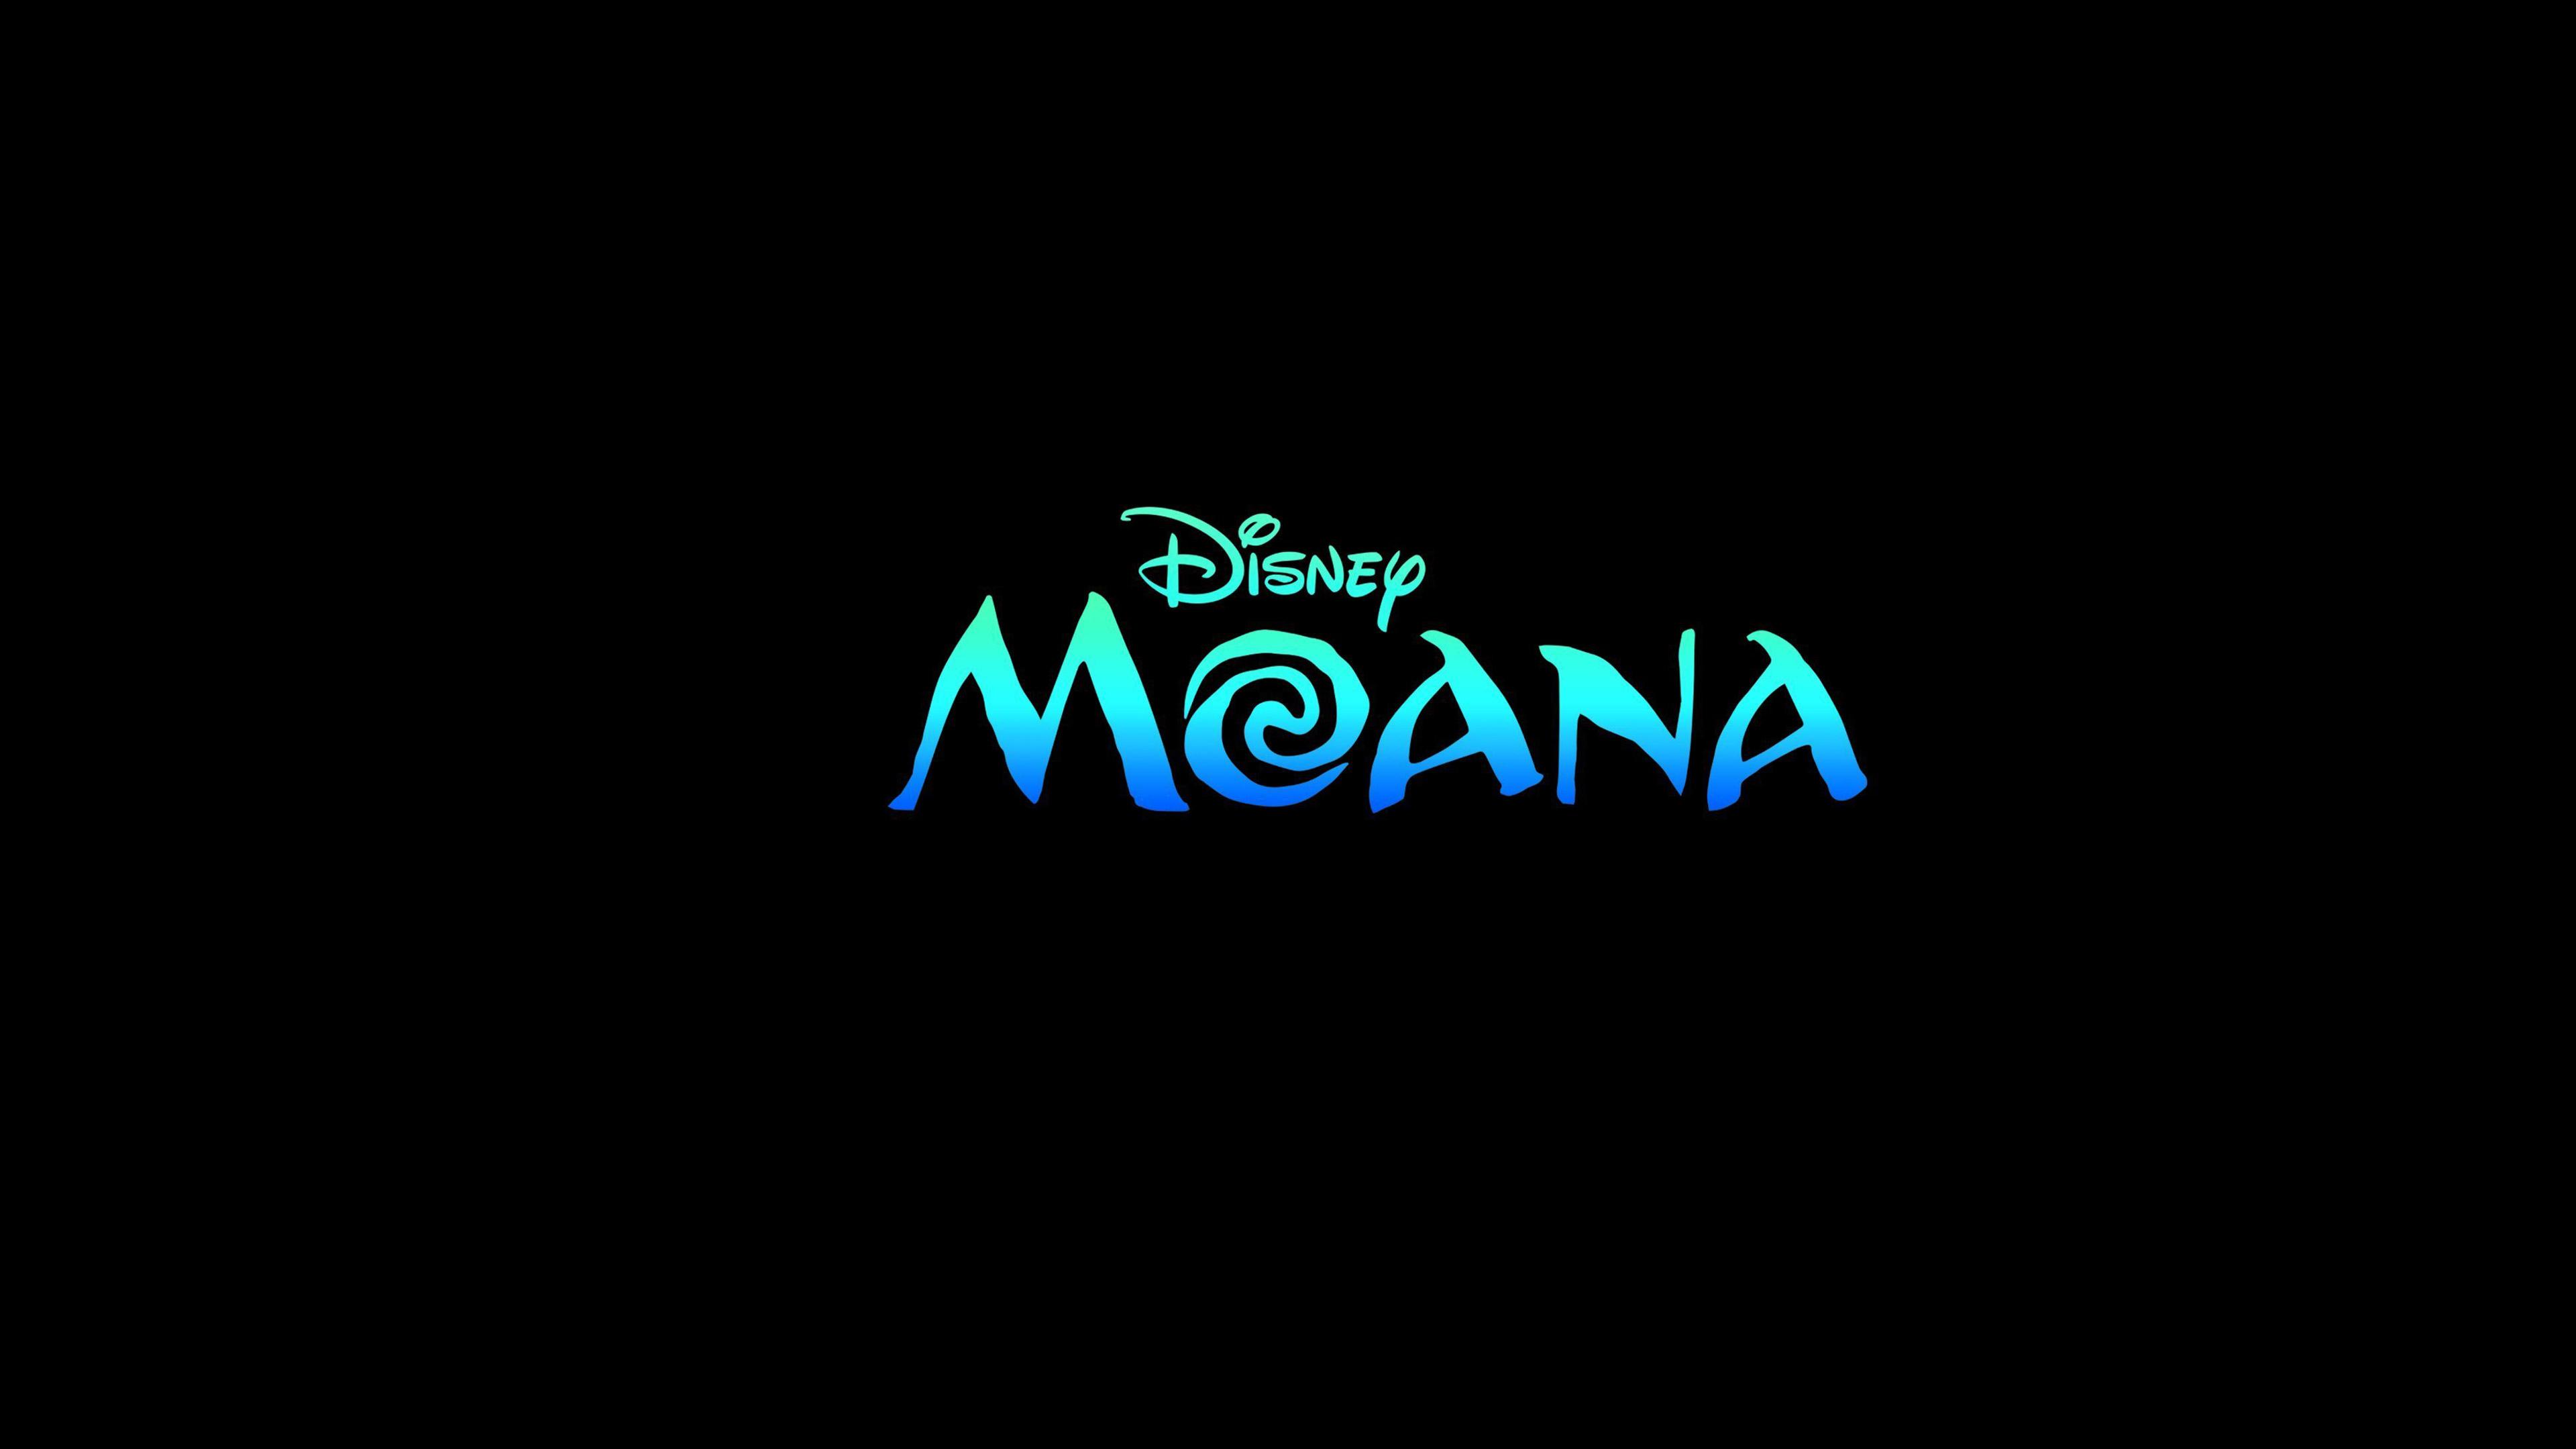 2048x1152 Moana Movie Logo Resolution HD 4k